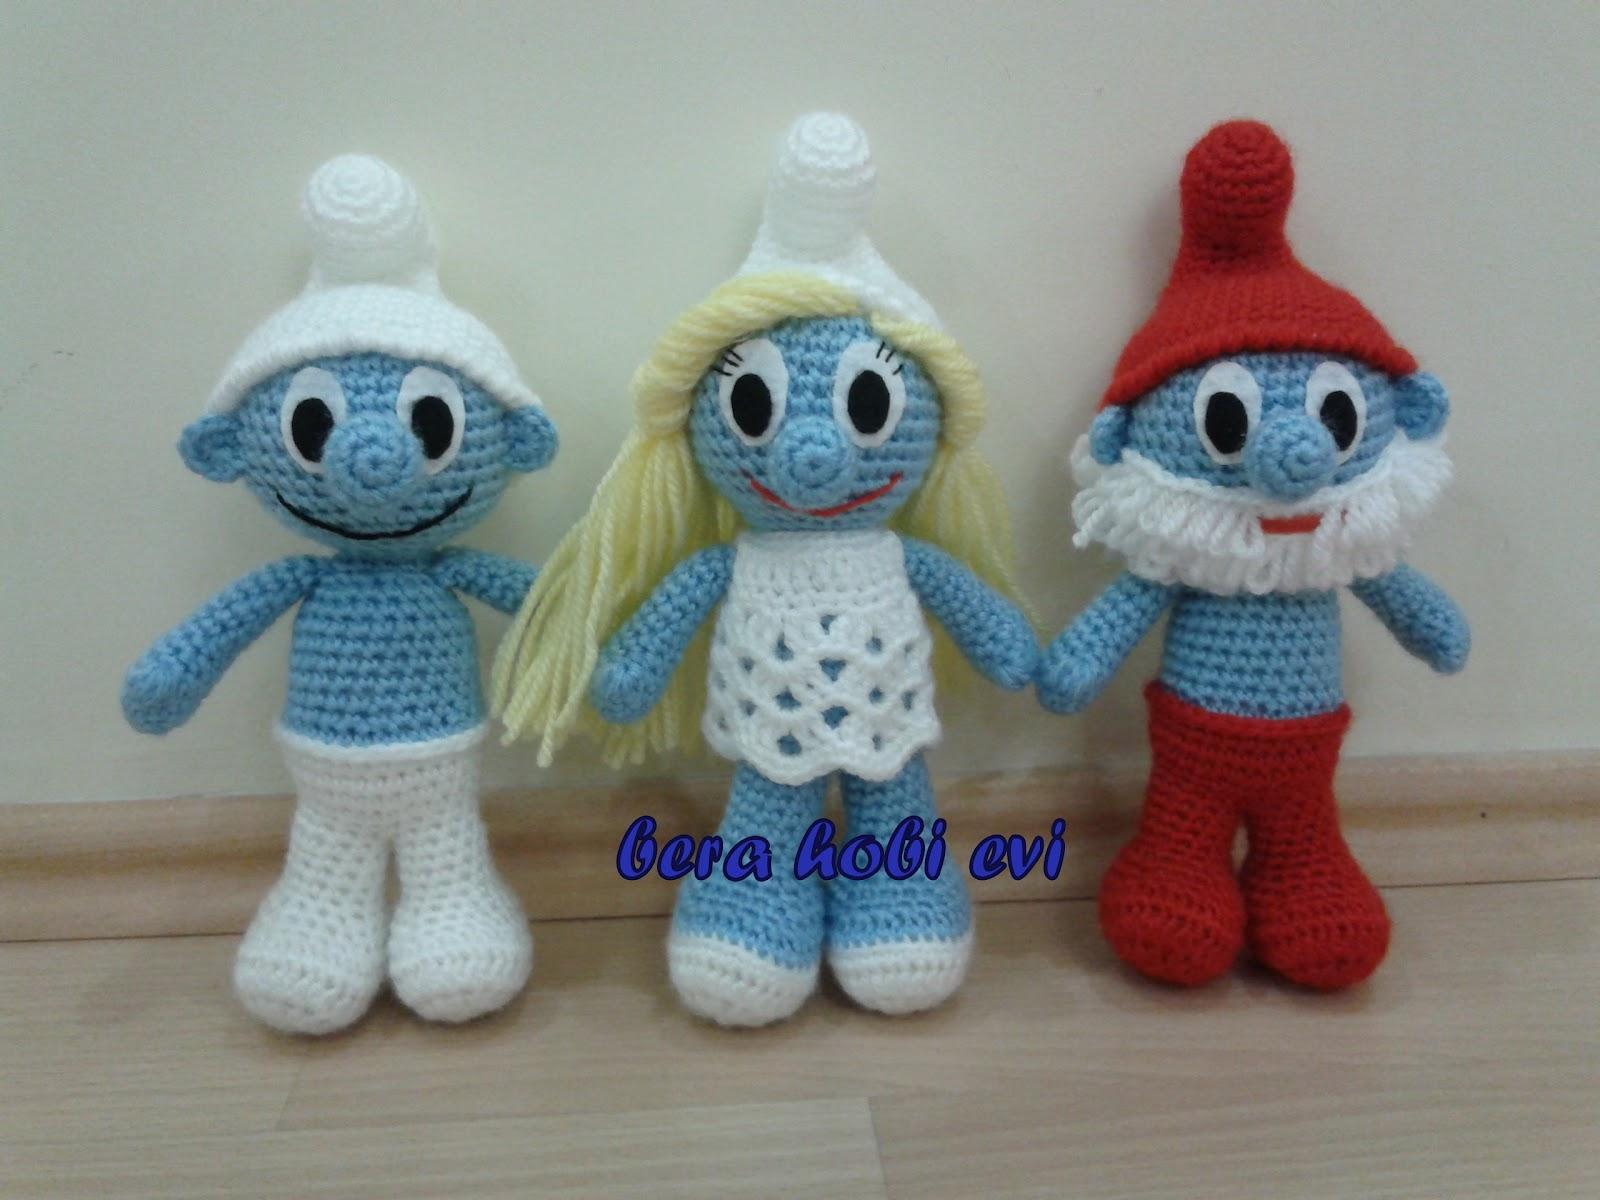 Learn How to Crochet Basic Beginner Amigurumi Smiley